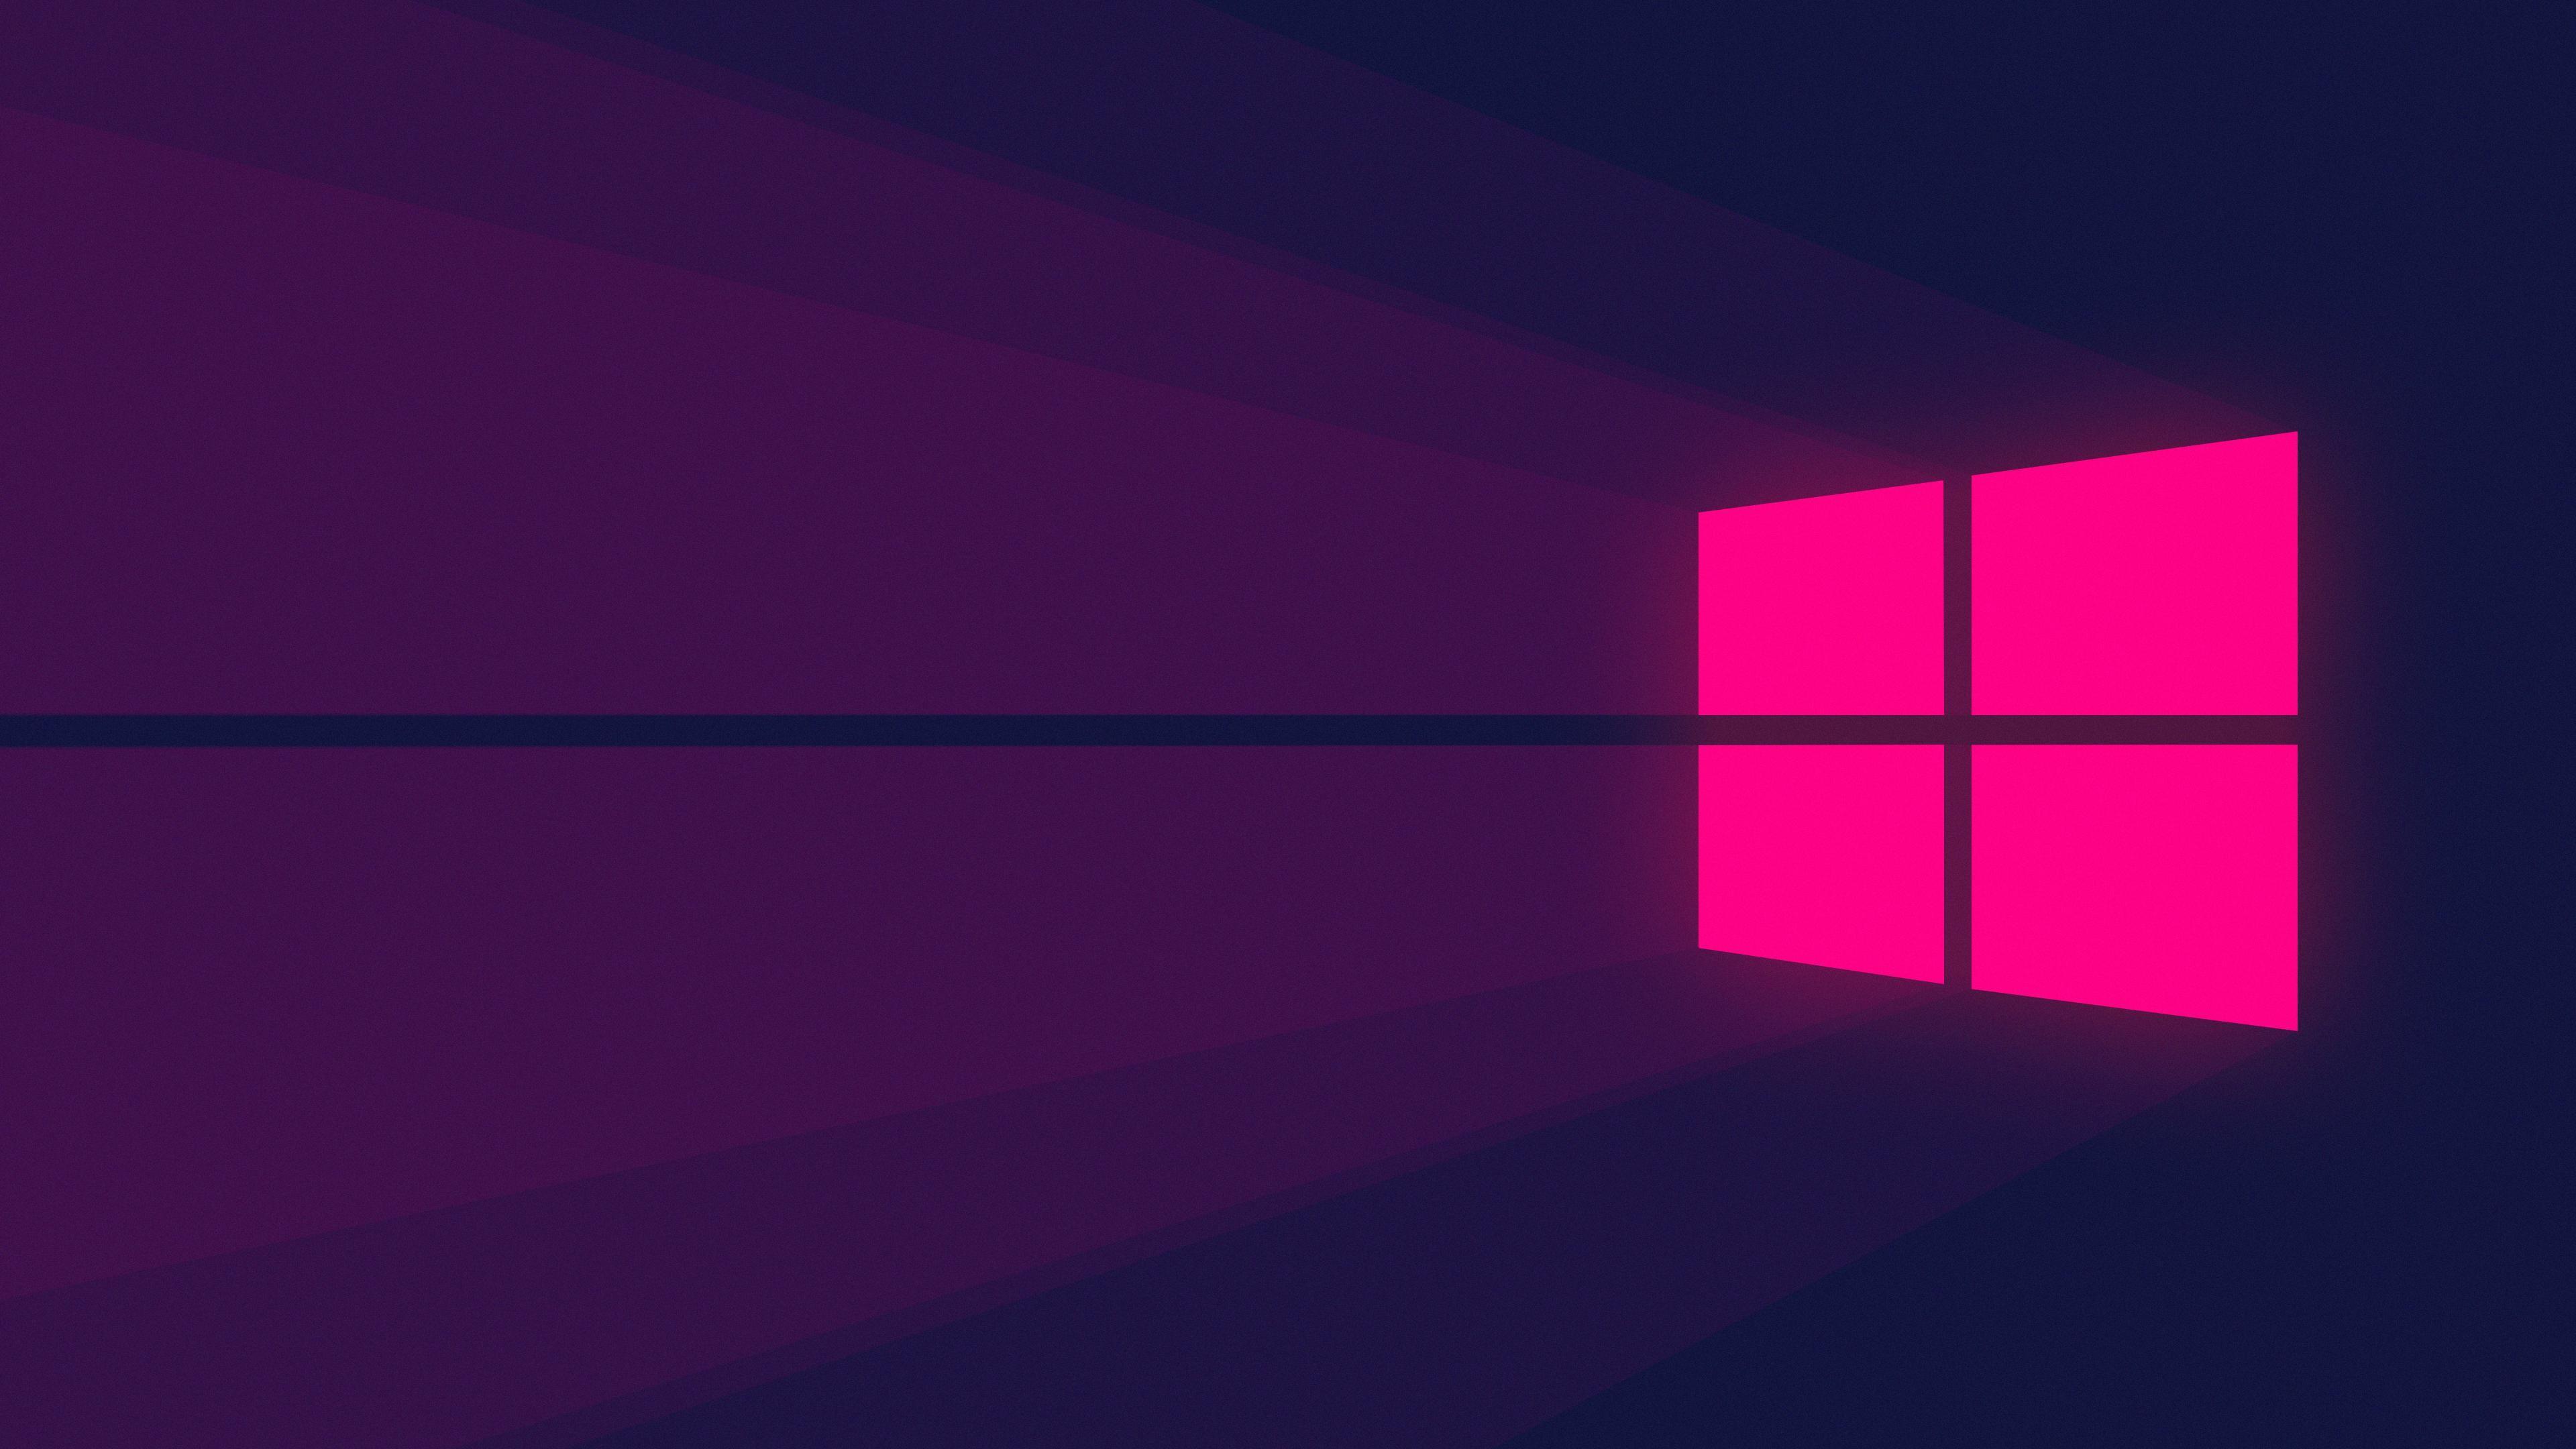 Windows Next Wallpaper In 4k 3840x2160 Music Indieartist